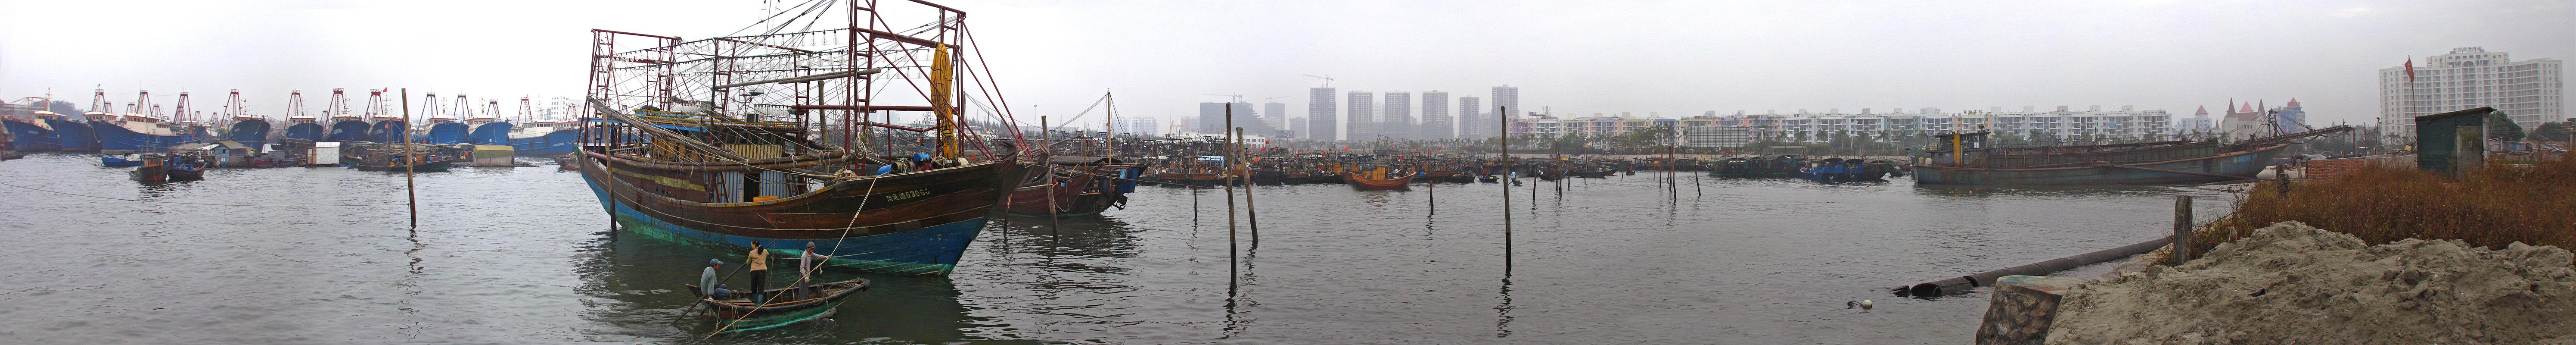 Beihai harbour by TulinovR